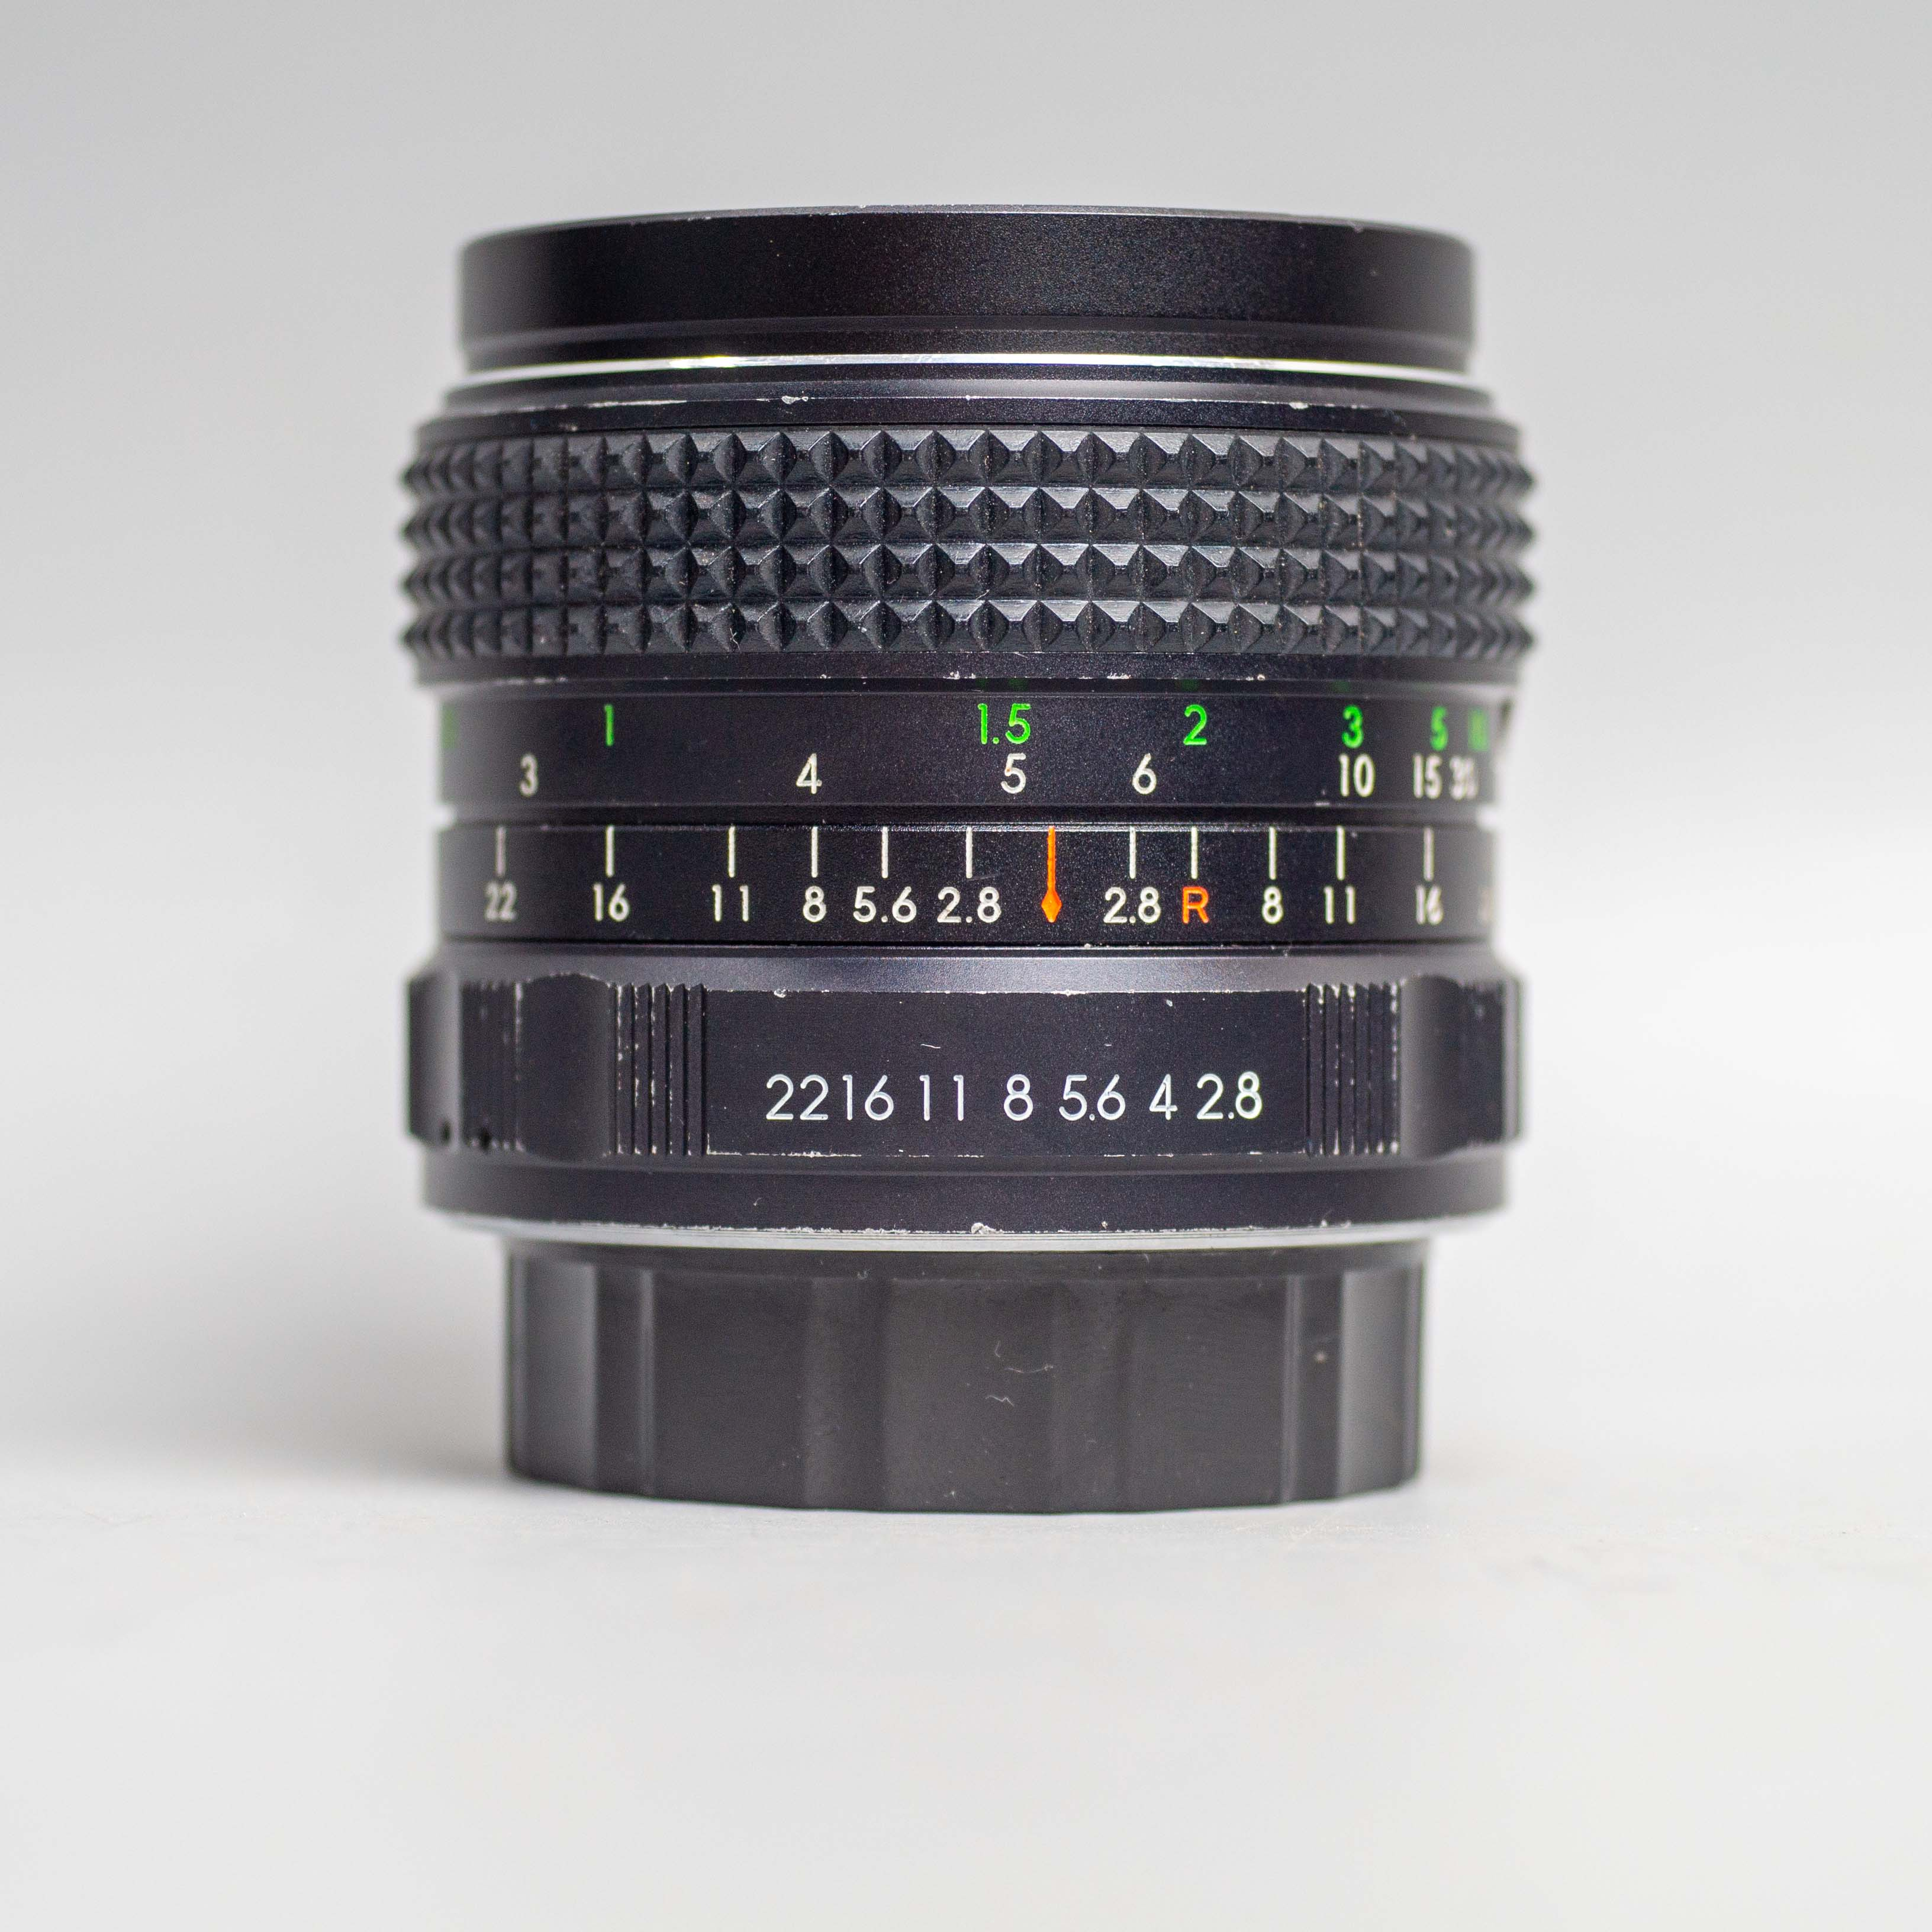 avanar-35mm-f2-8-mf-ngam-pentax-pk-35-2-8-17598